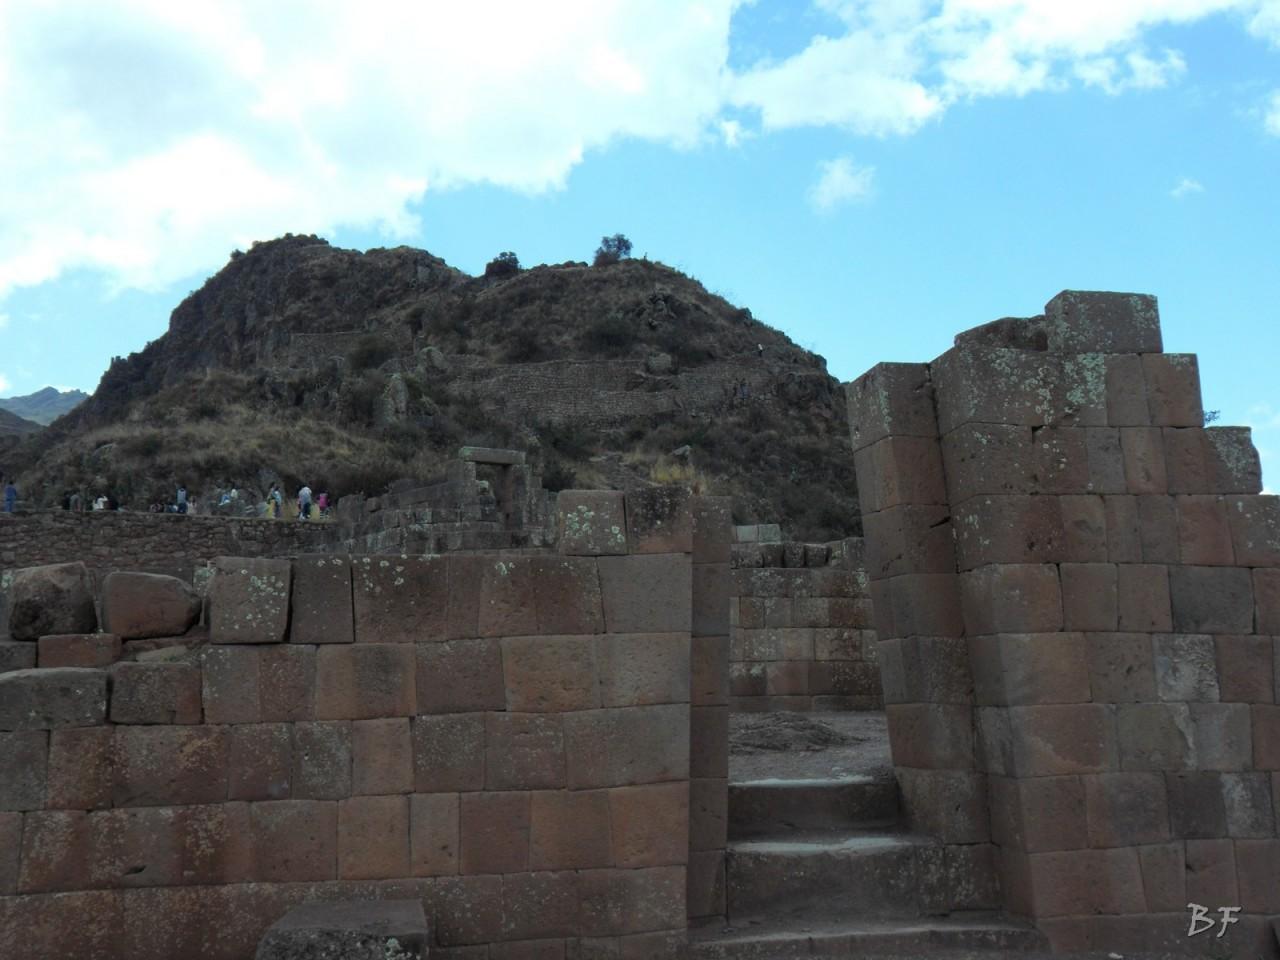 Mura-Poligonali-Megaliti-Altari-Rupestri-Pisac-Cusco-Perù-74